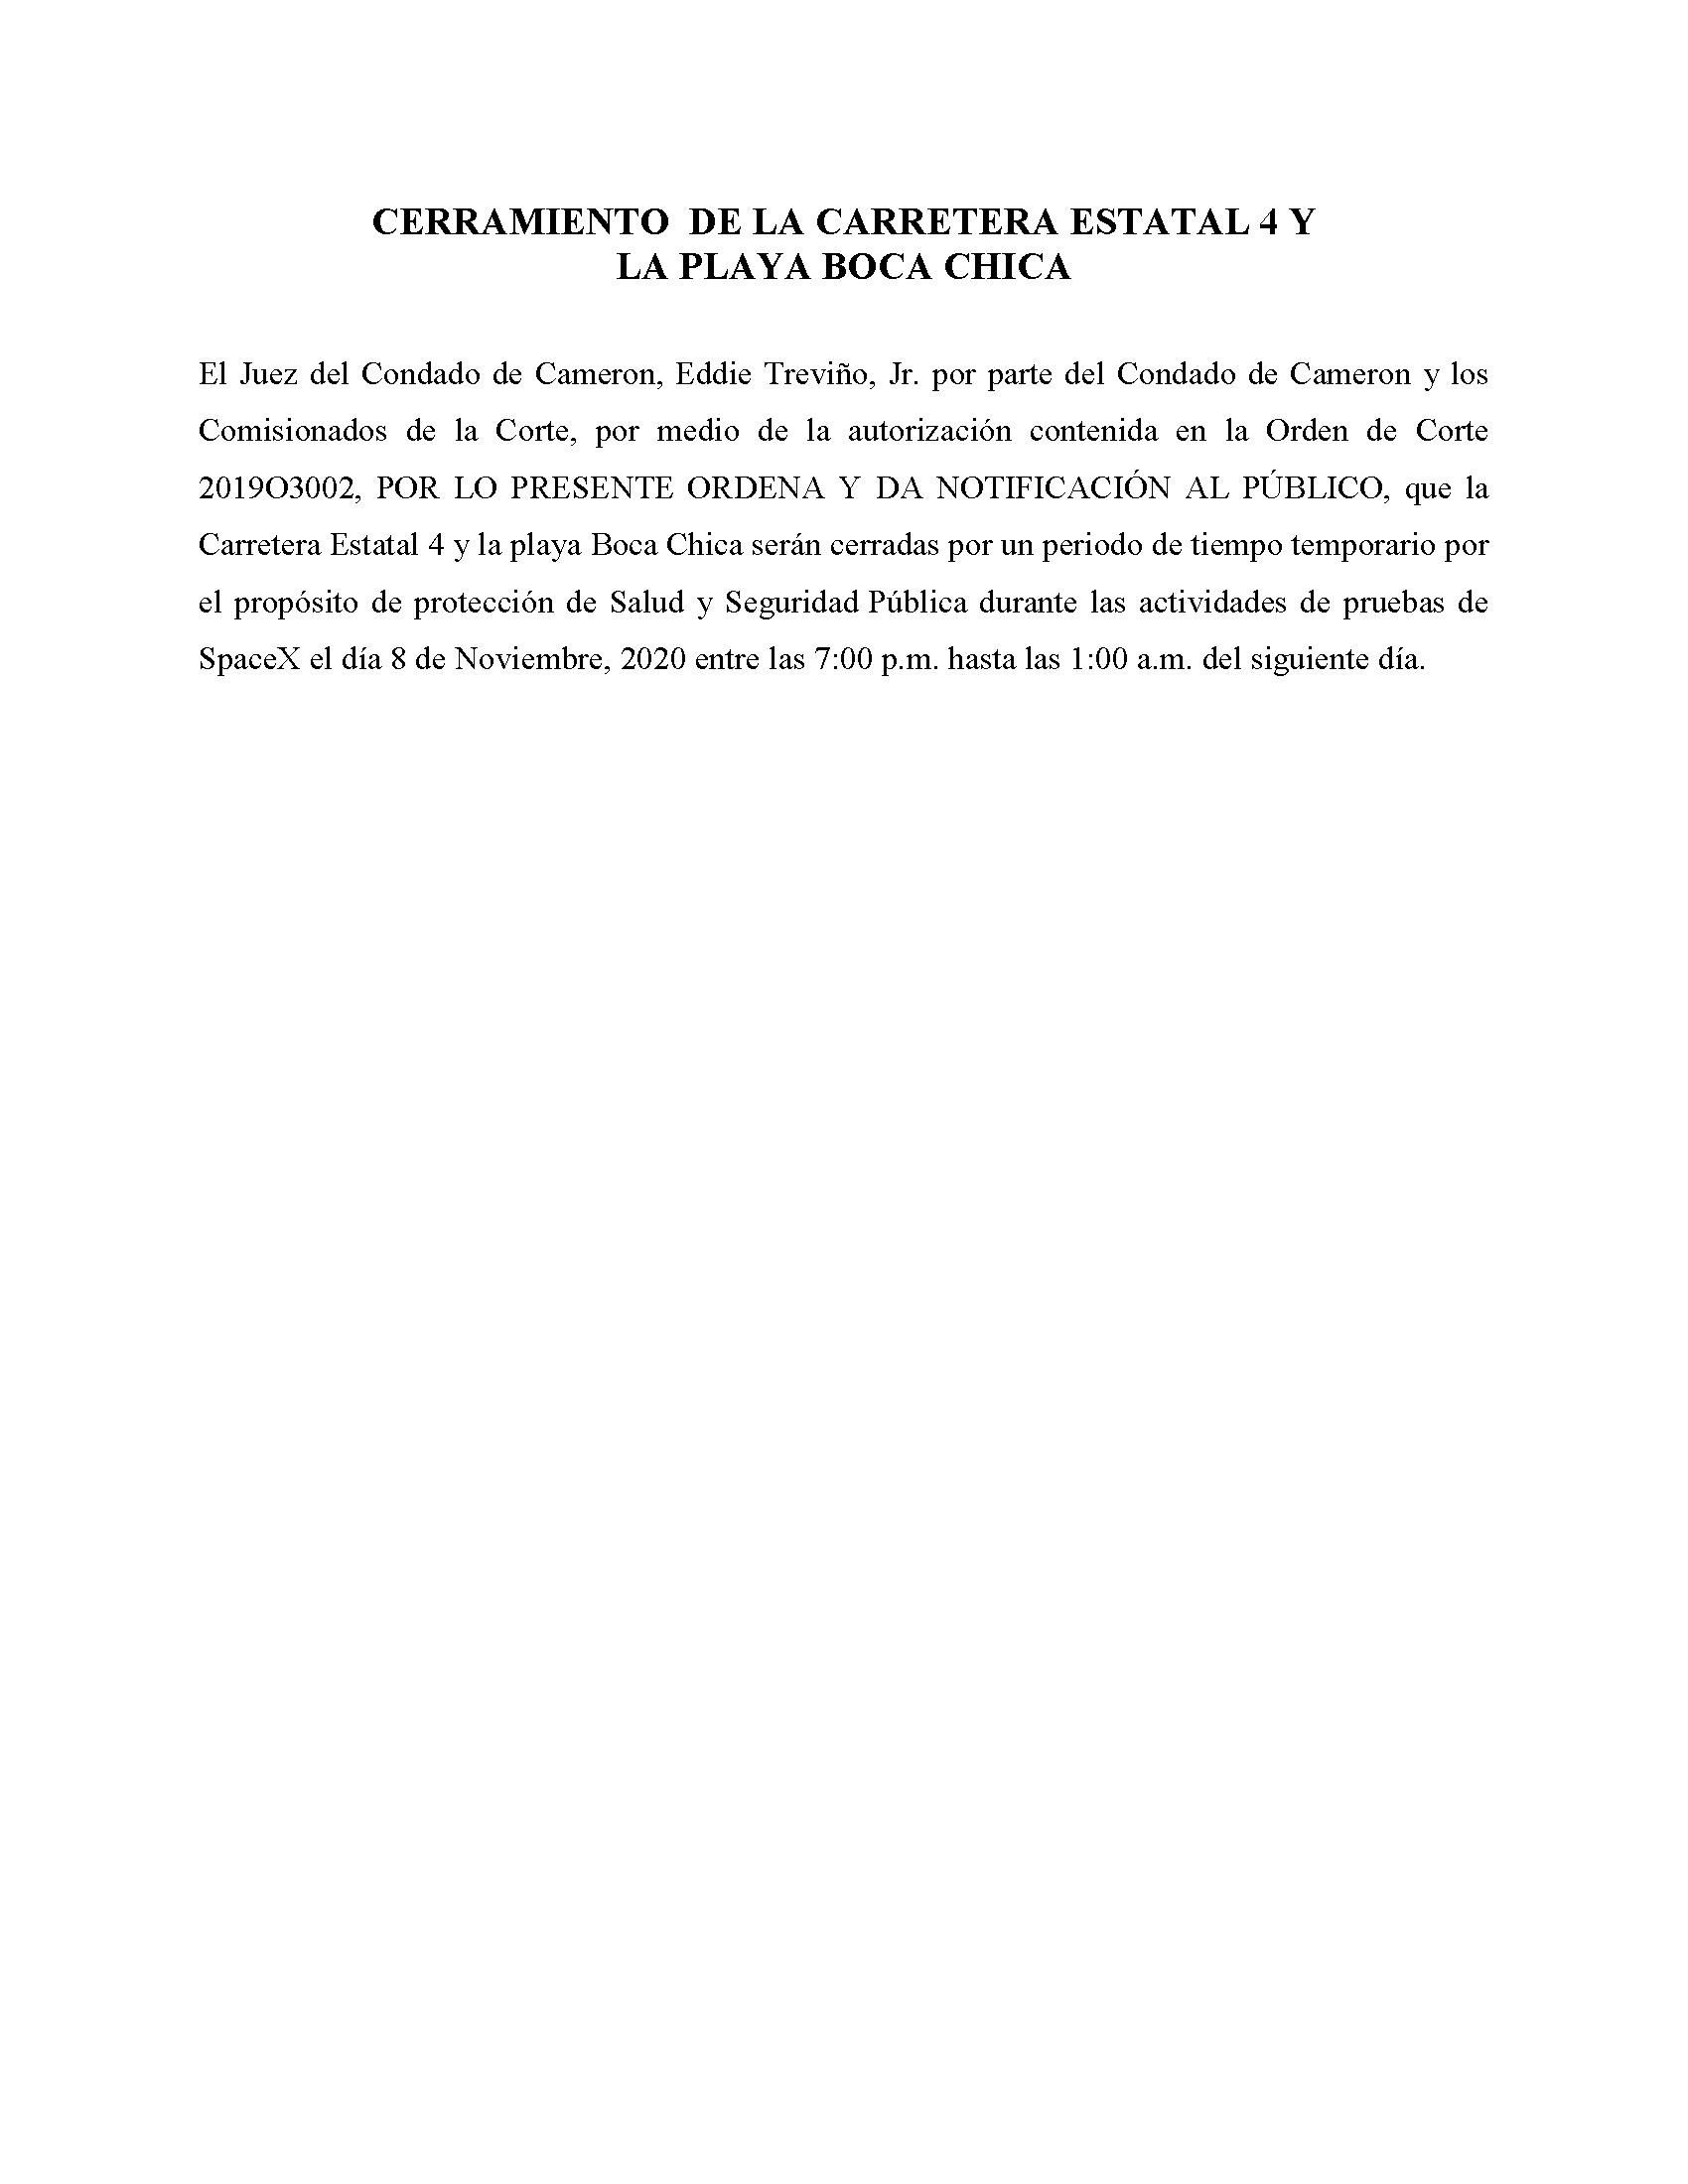 ORDER.CLOSURE OF HIGHWAY 4 Y LA PLAYA BOCA CHICA.SPANISH.11.08.20